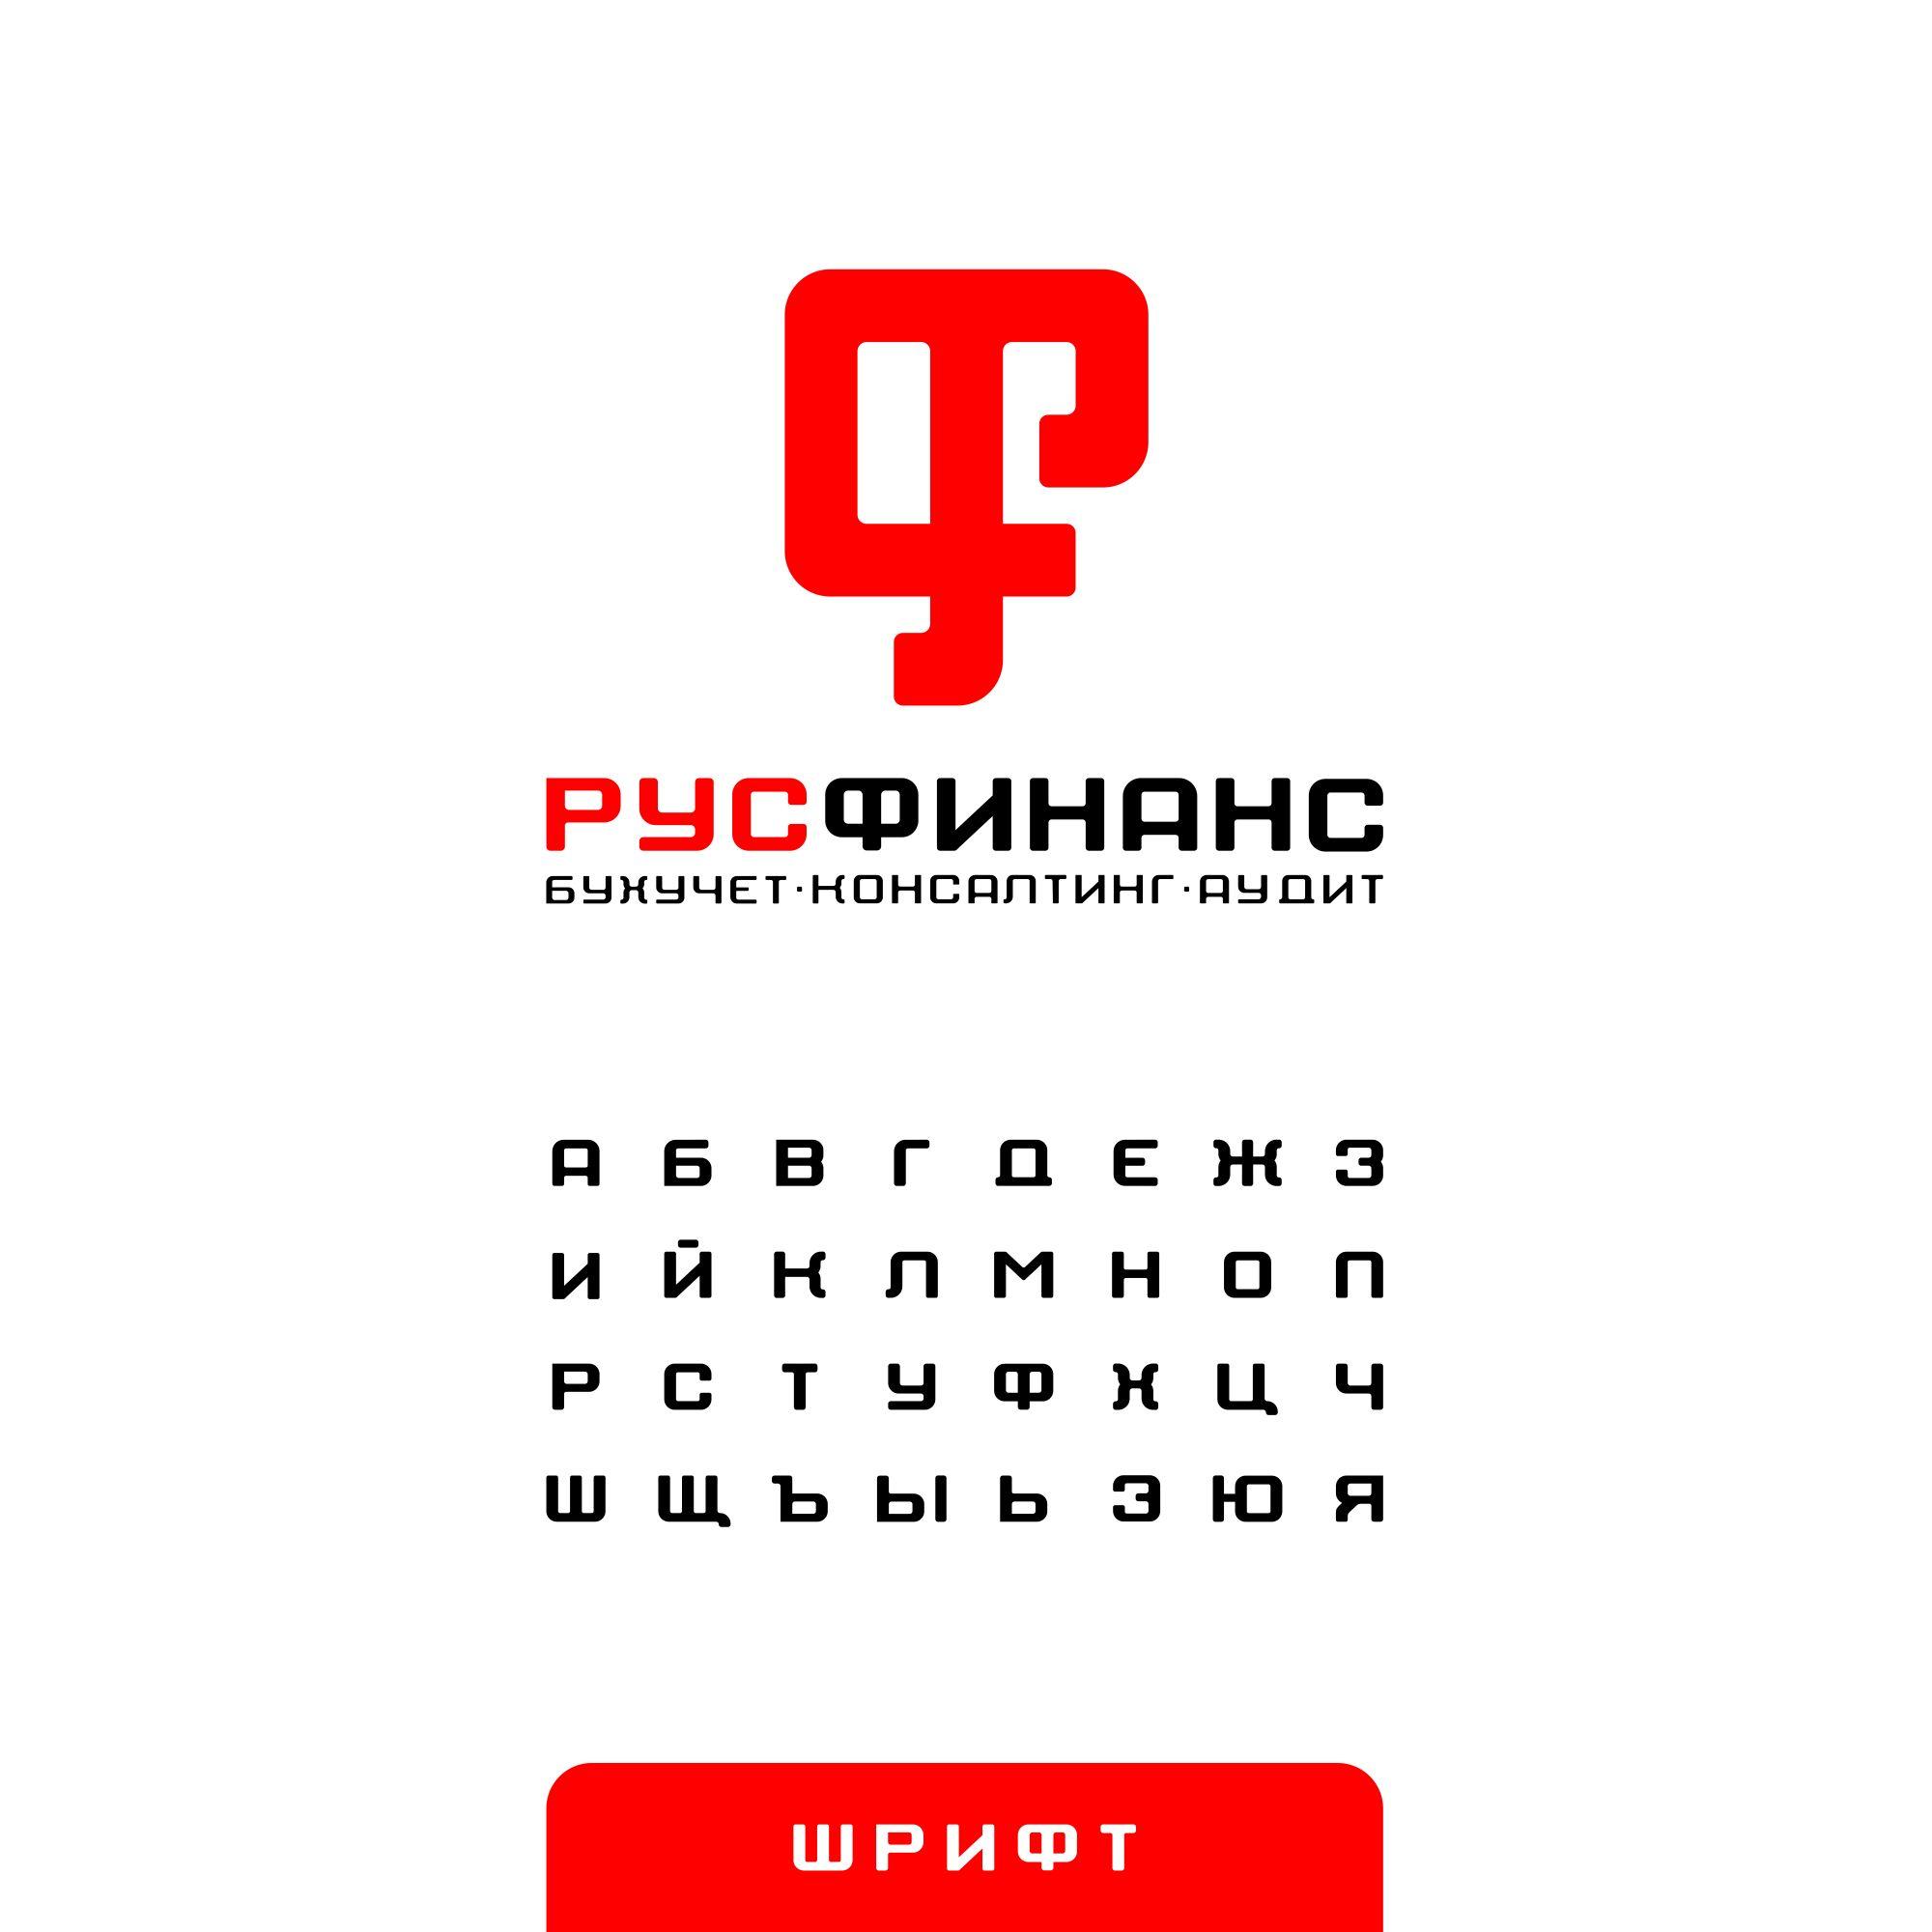 Логотип для Русфинанс - дизайнер smithy-style